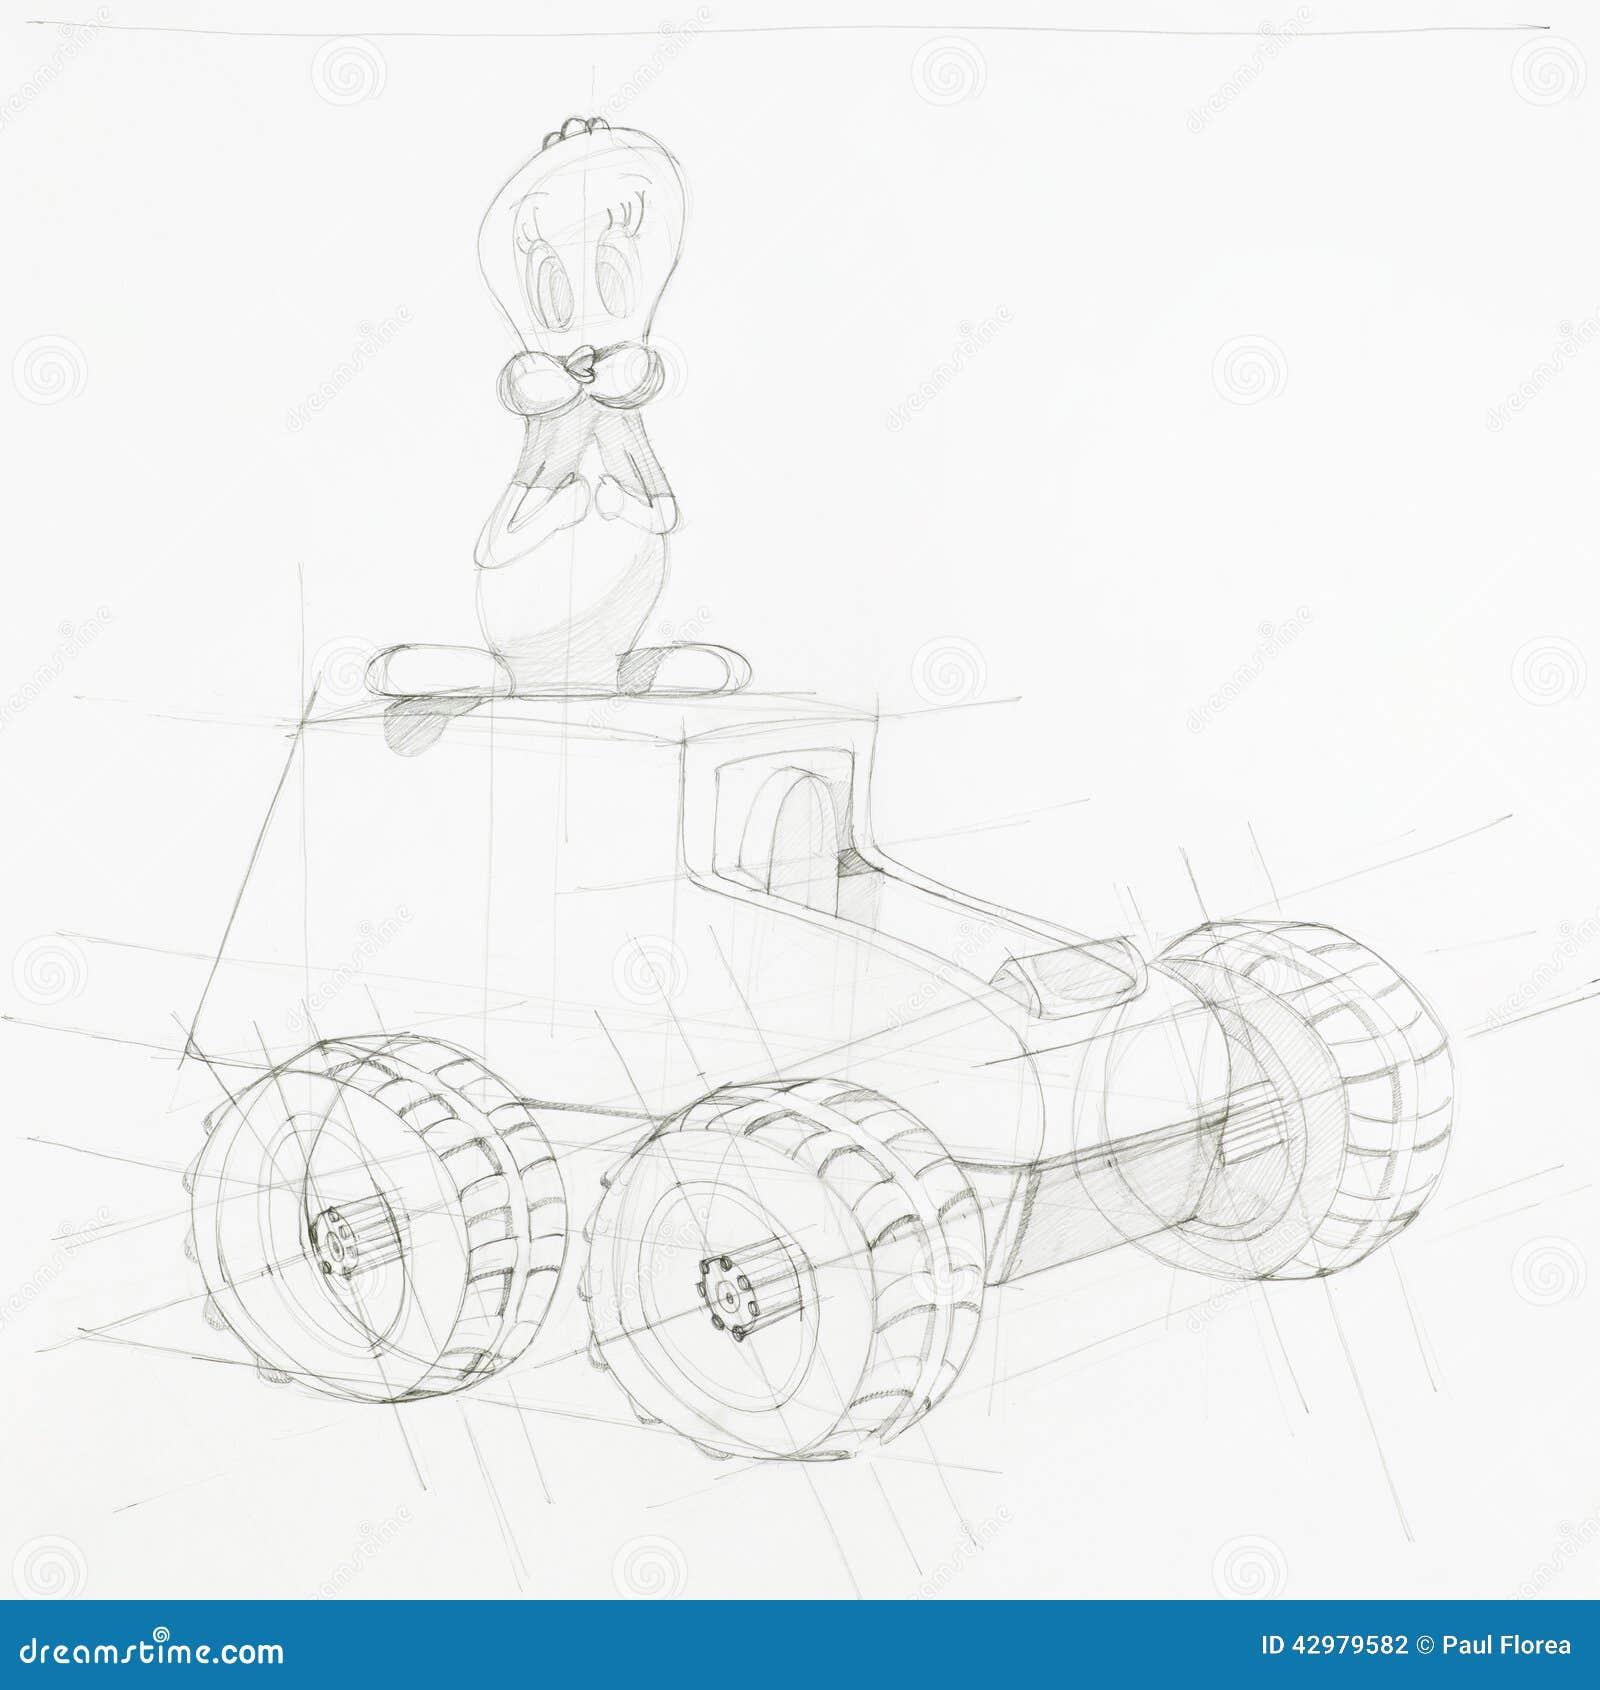 Blueprint of toy car stock illustration. Illustration of forms ...